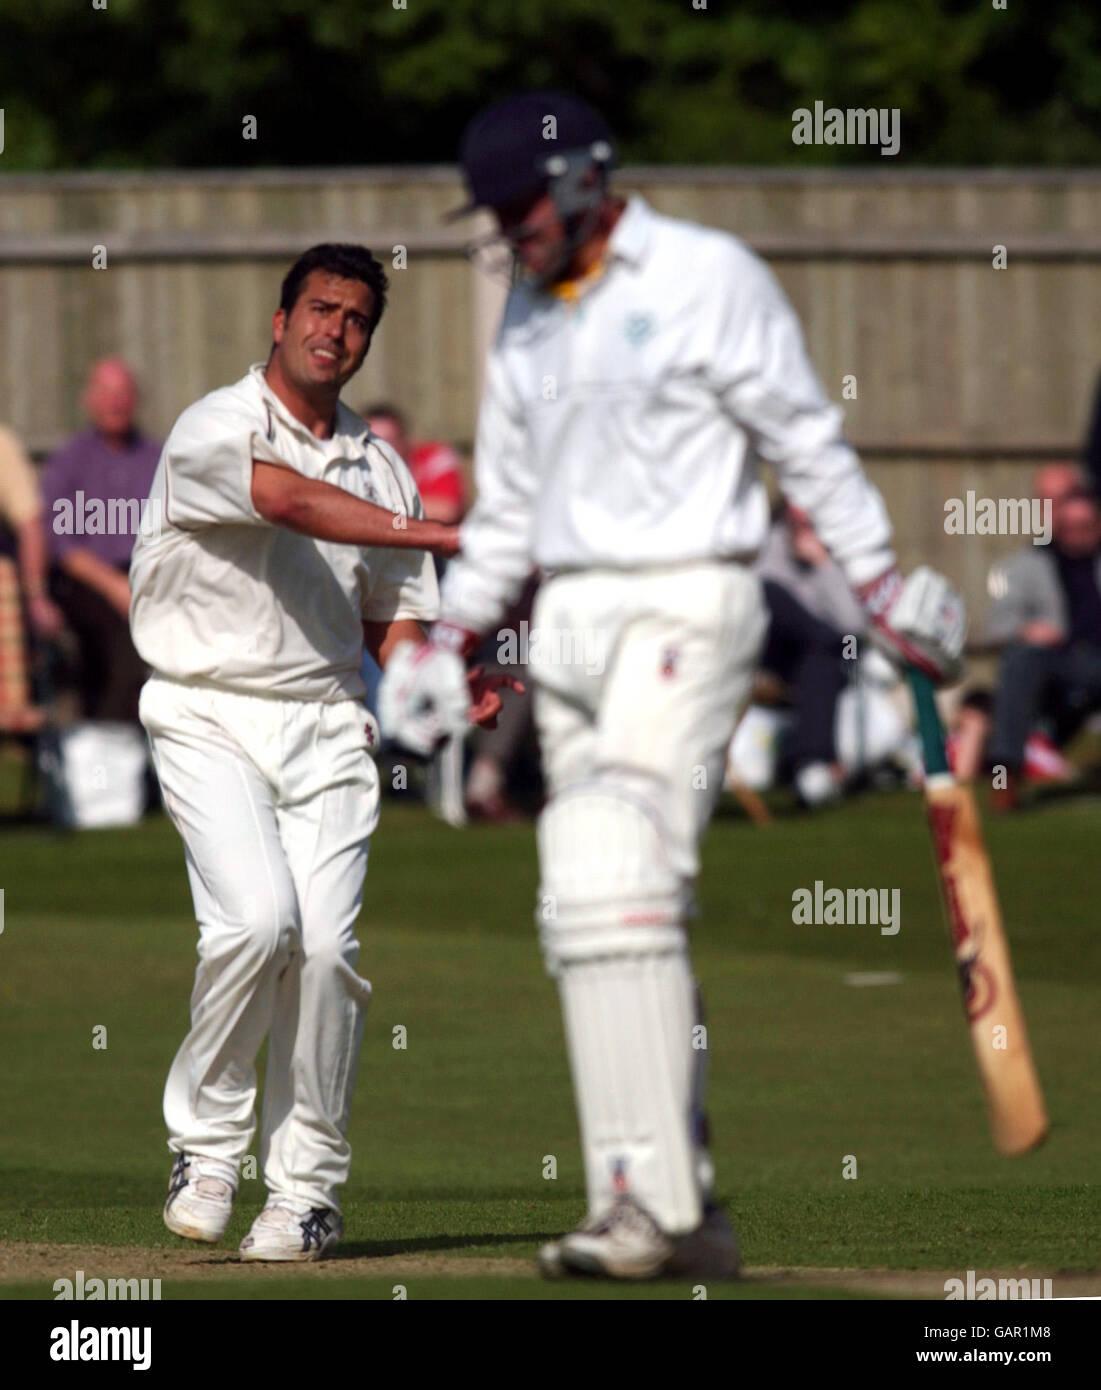 Cricket - Cheltenham & Gloucester Trophy - Third Round - Staffordshire v Surrey - Stock Image